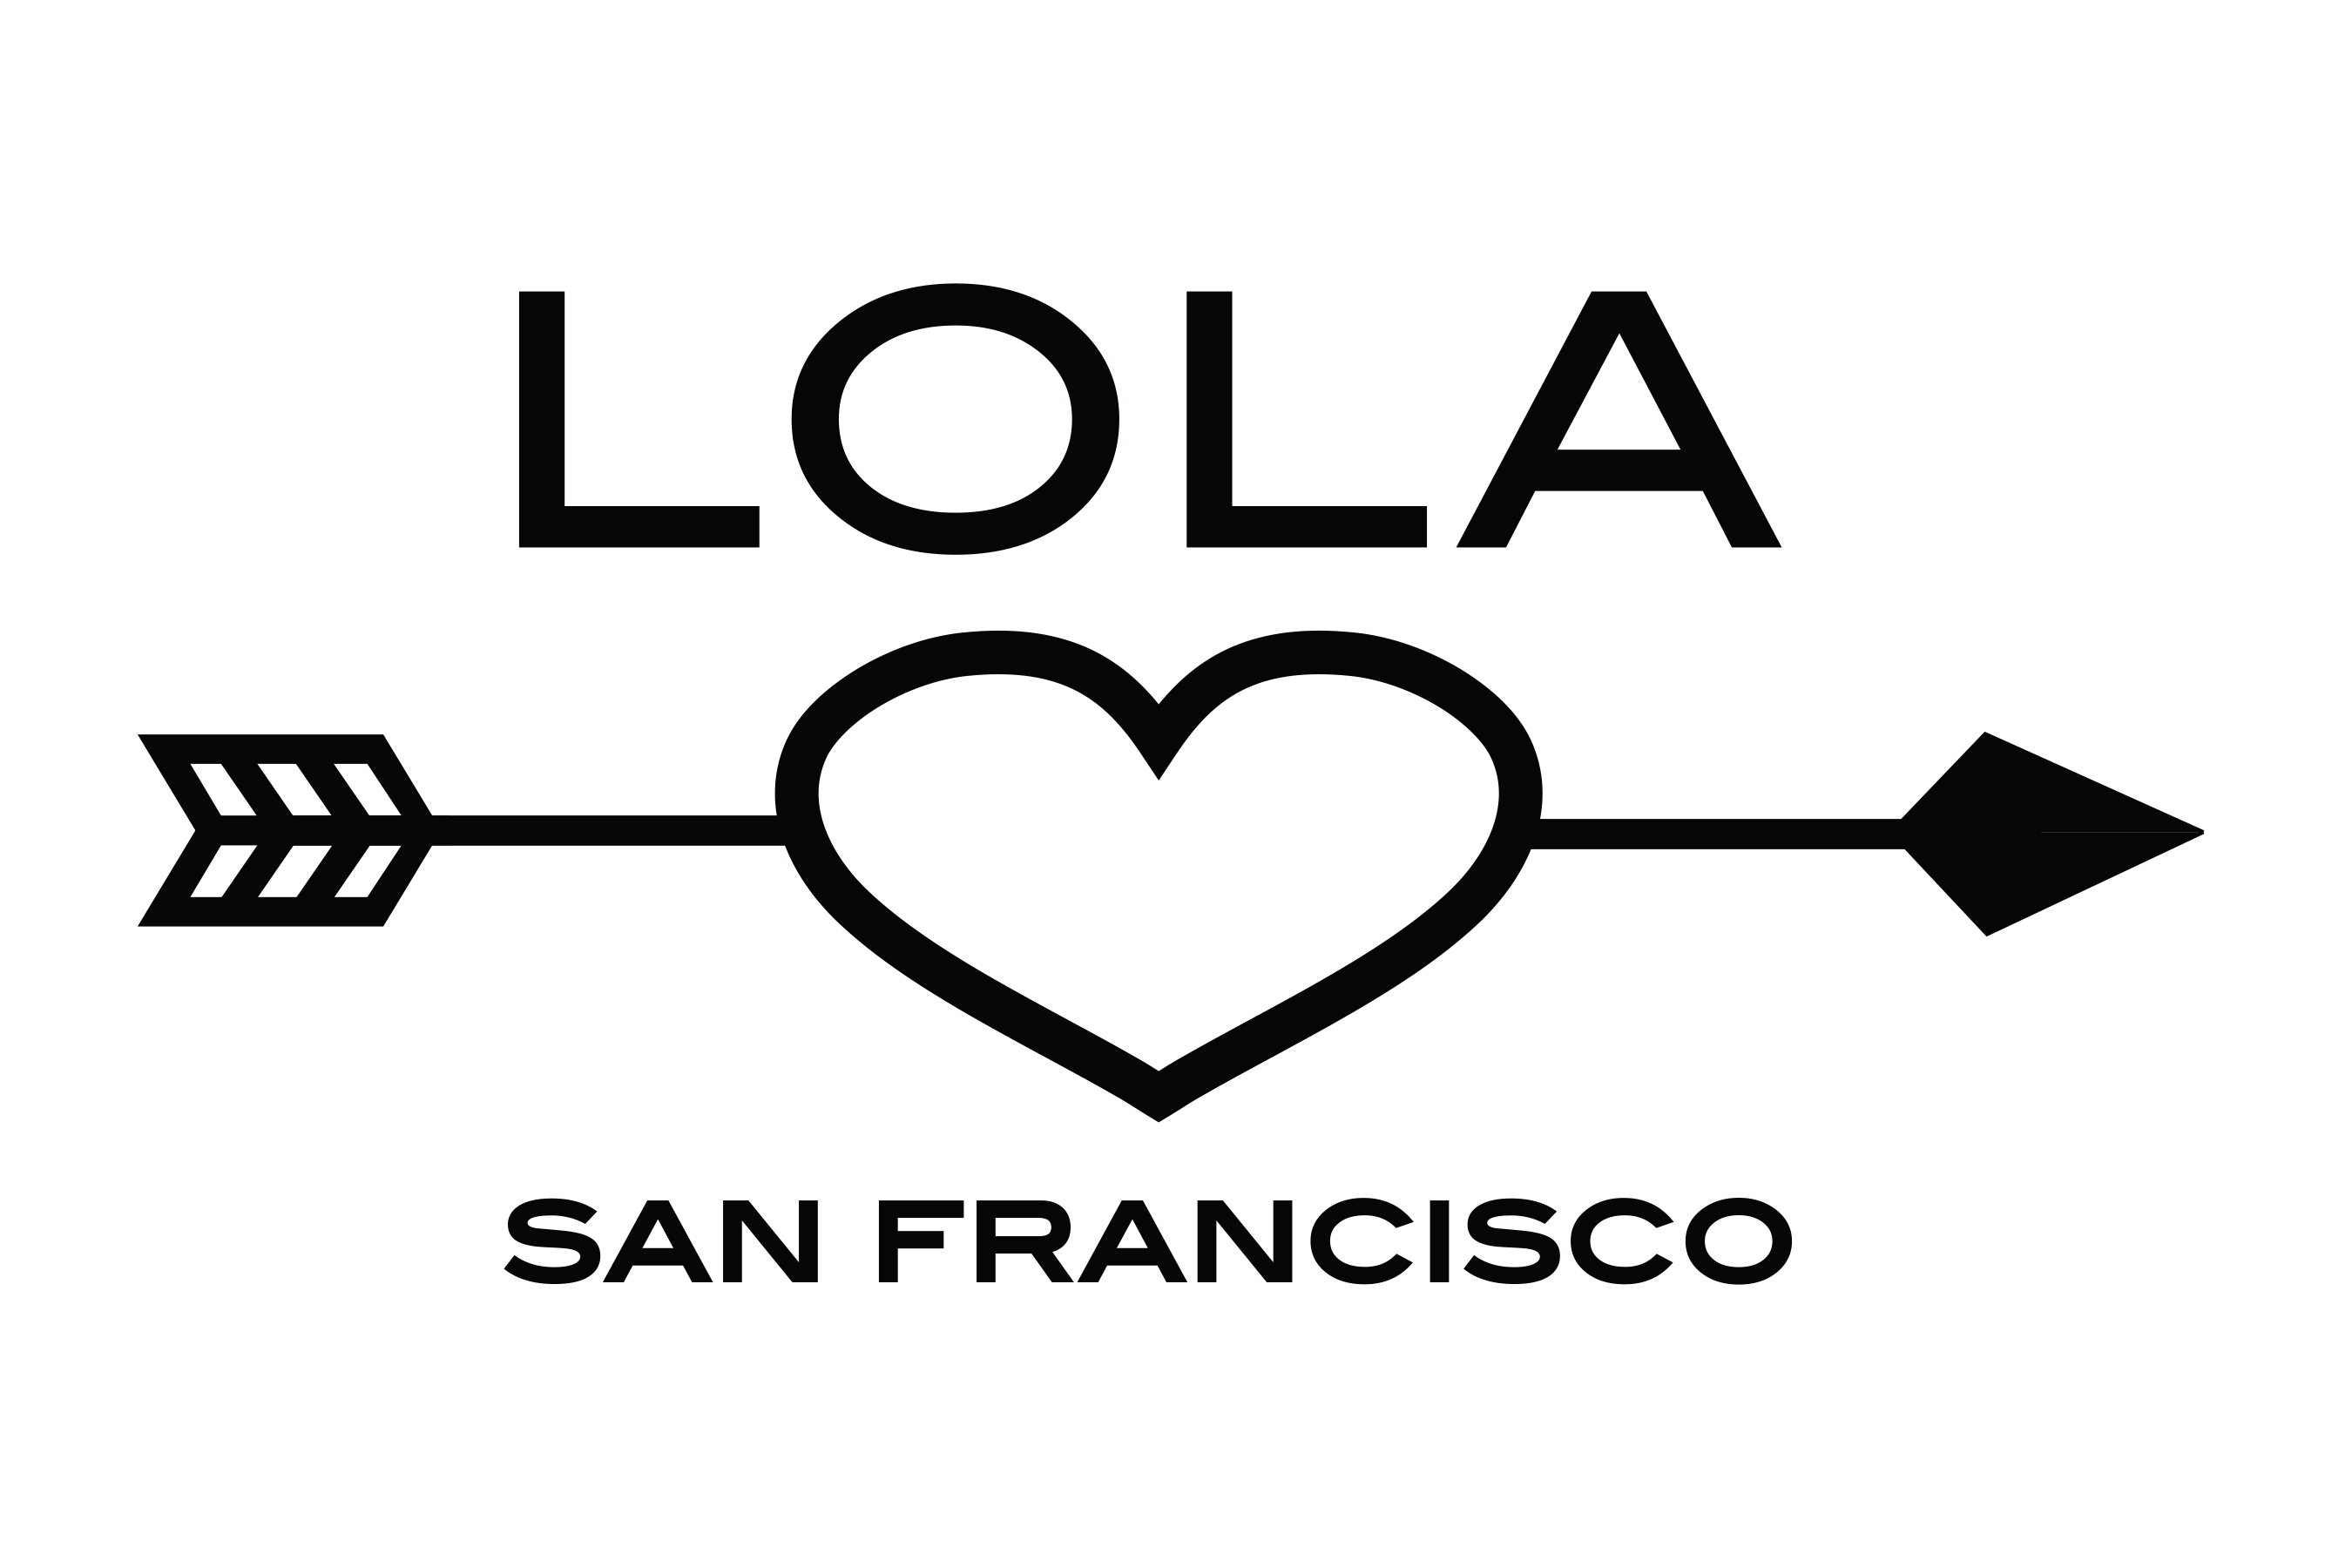 lola logo 2017 clear heart final